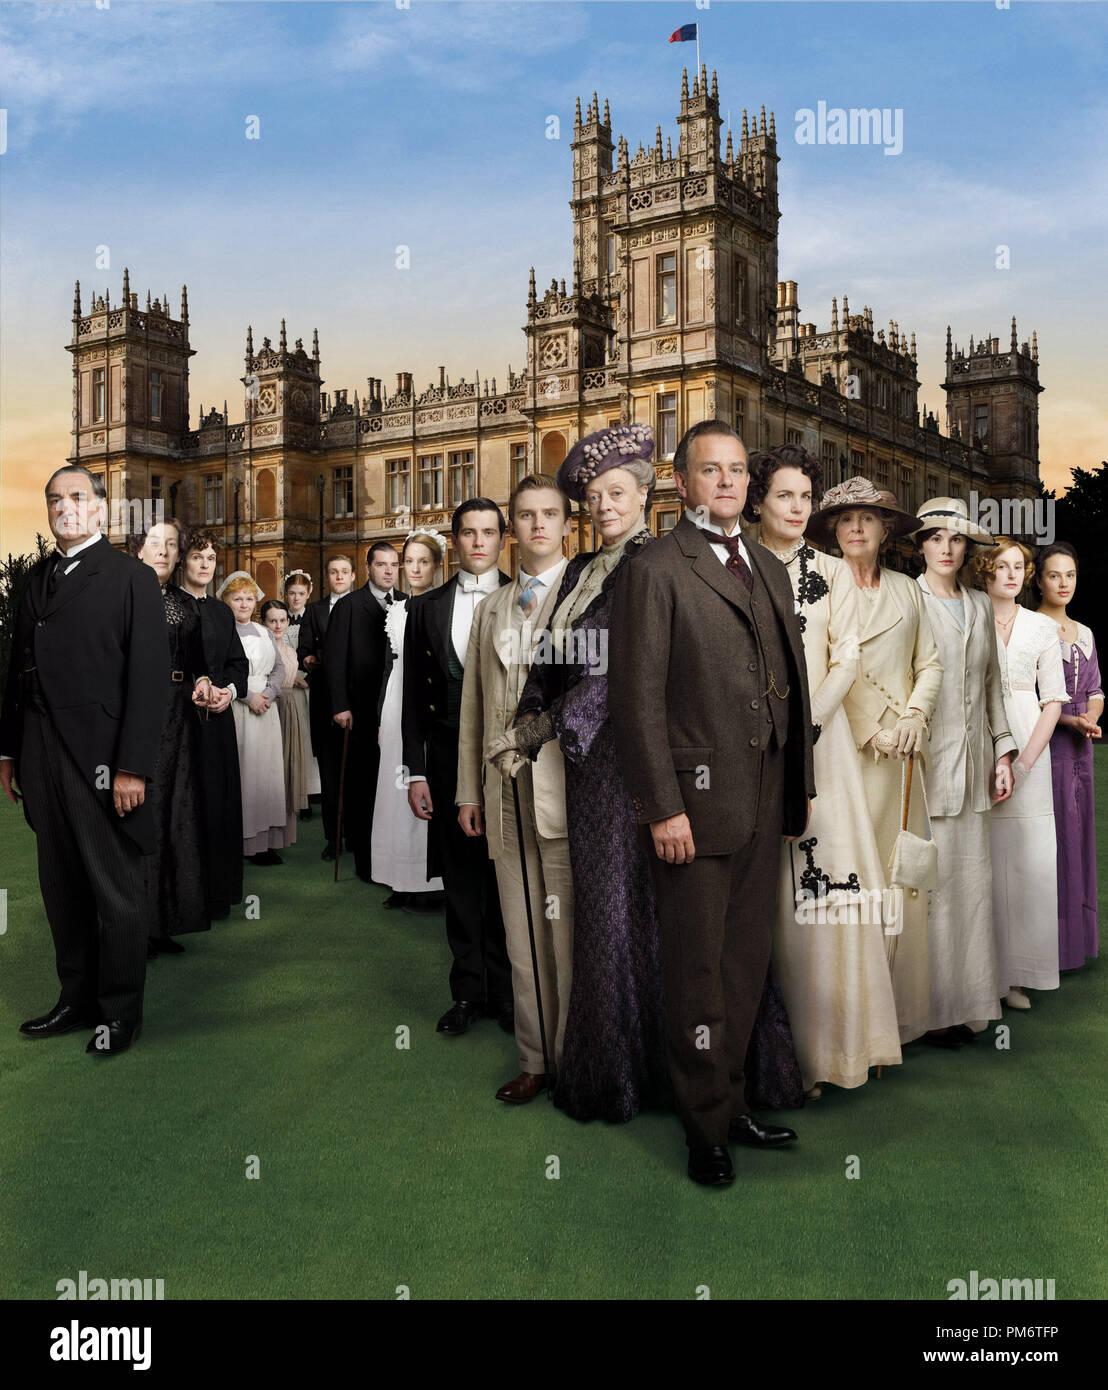 Maggie Smith, Elizabeth McGovern and Cast in Downton Abbey Stock Photo